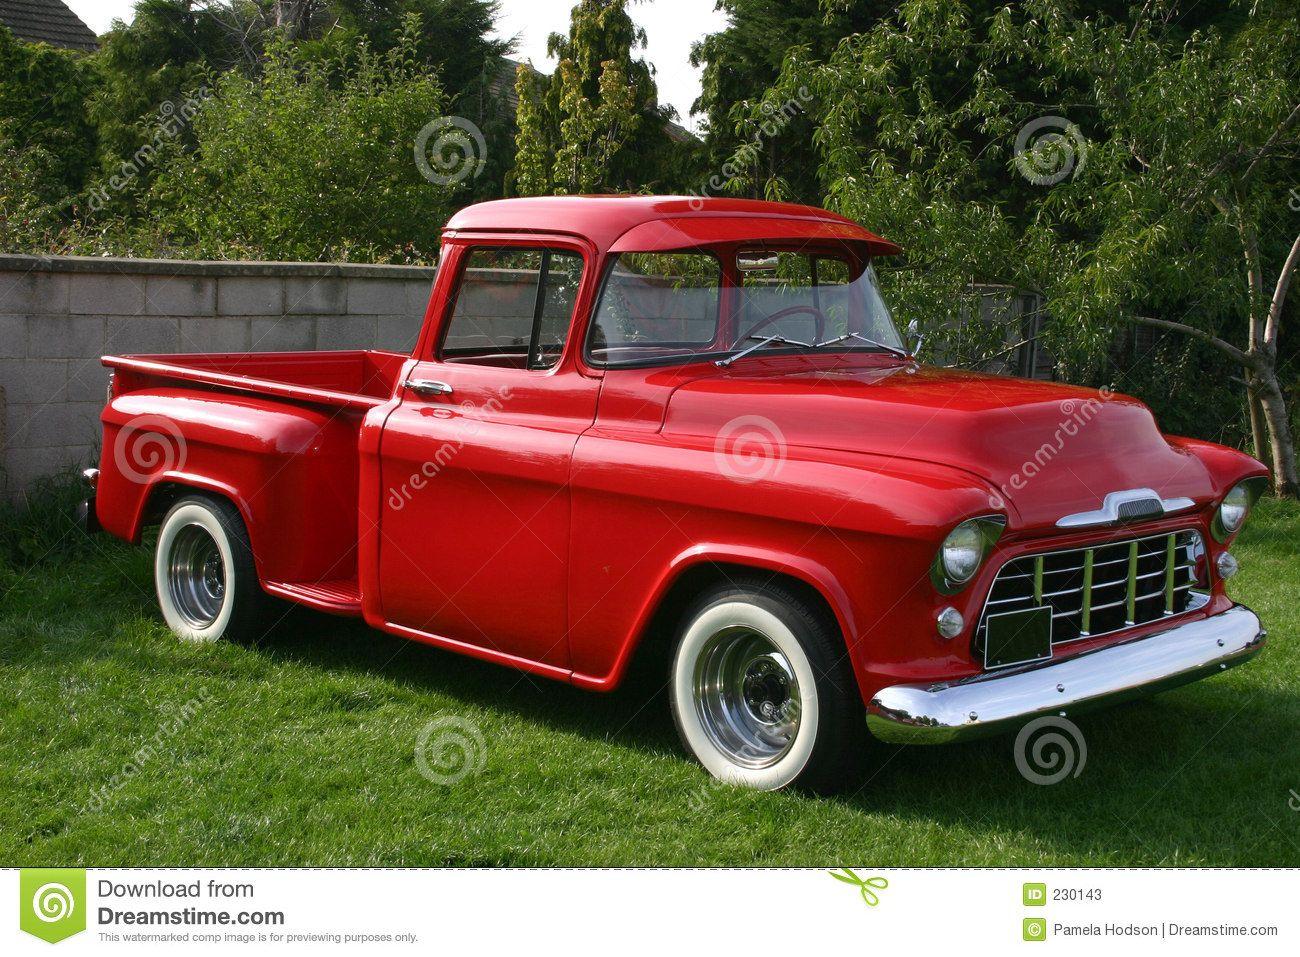 Chevrolet Truck Chevrolet Trucks Chevrolet Trucks